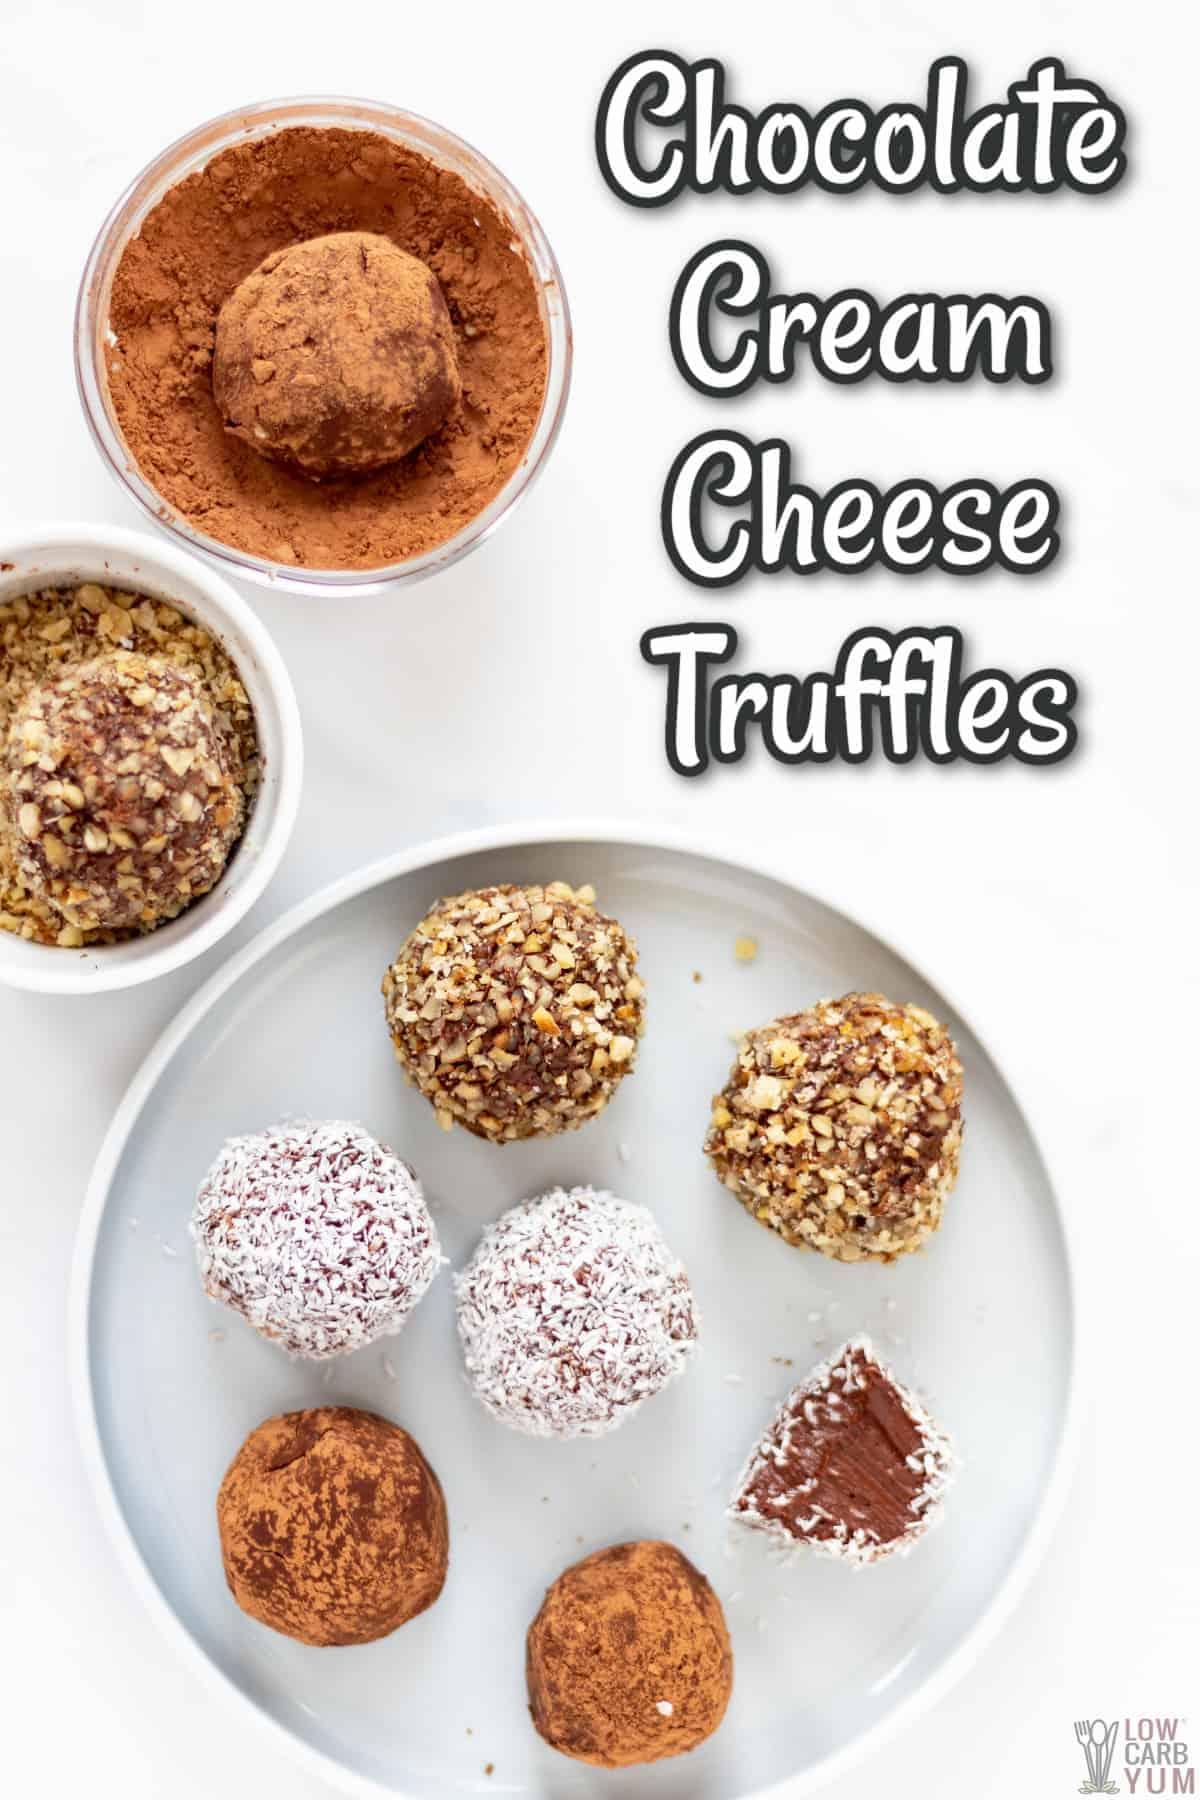 chocolate cream cheese truffles recipe cover image